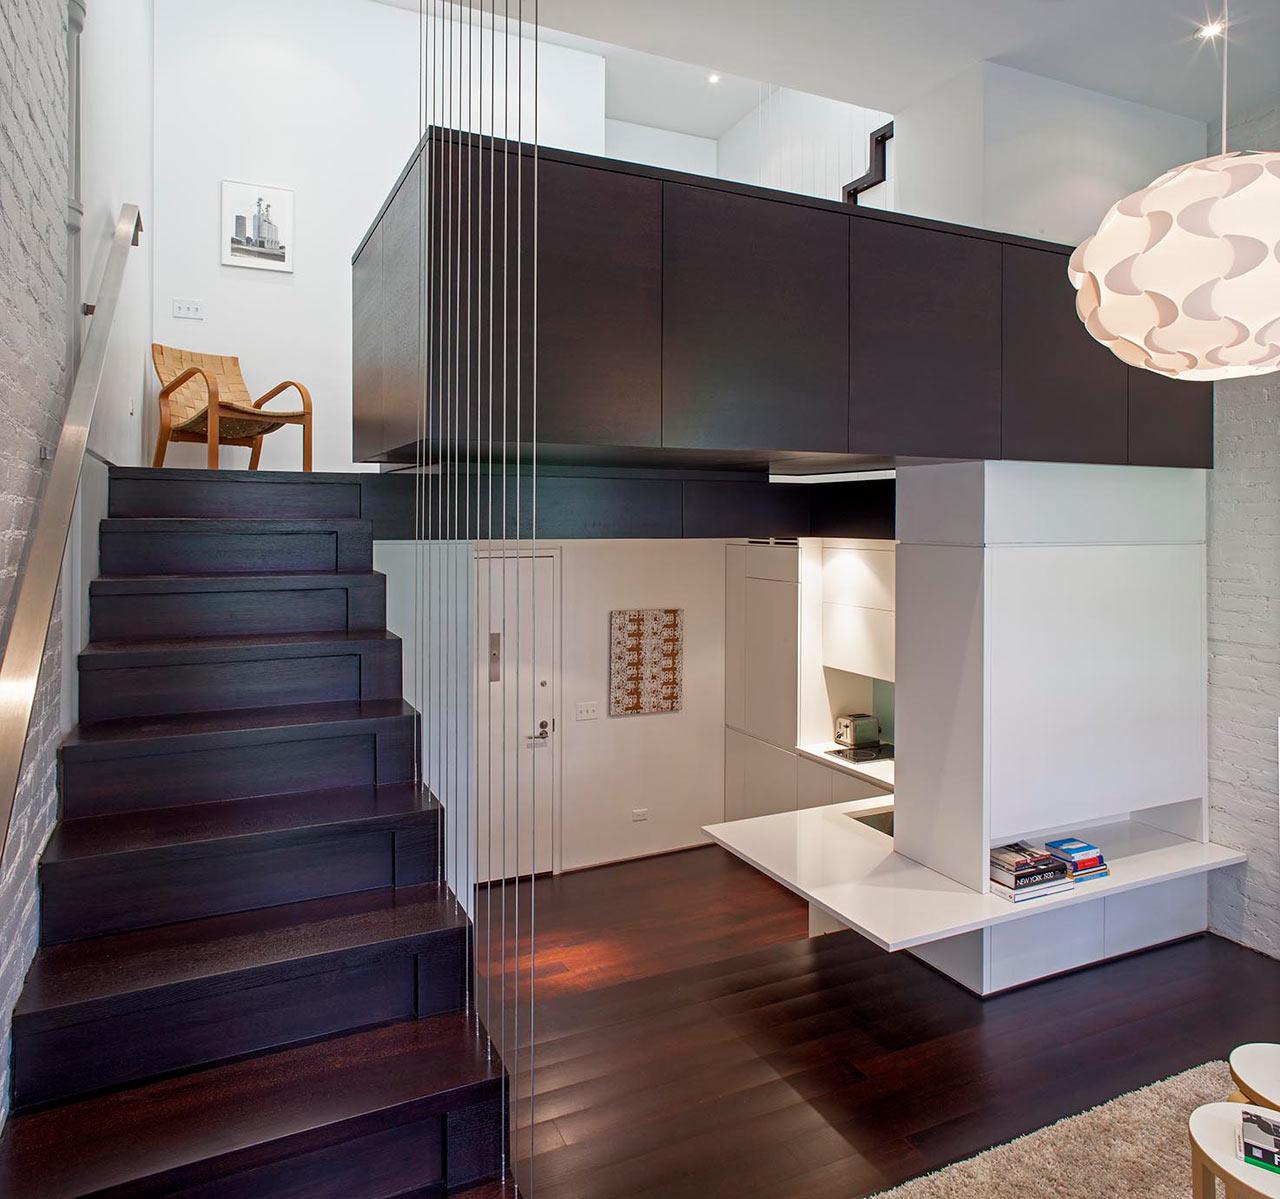 Micro living - amazing micro-apartments